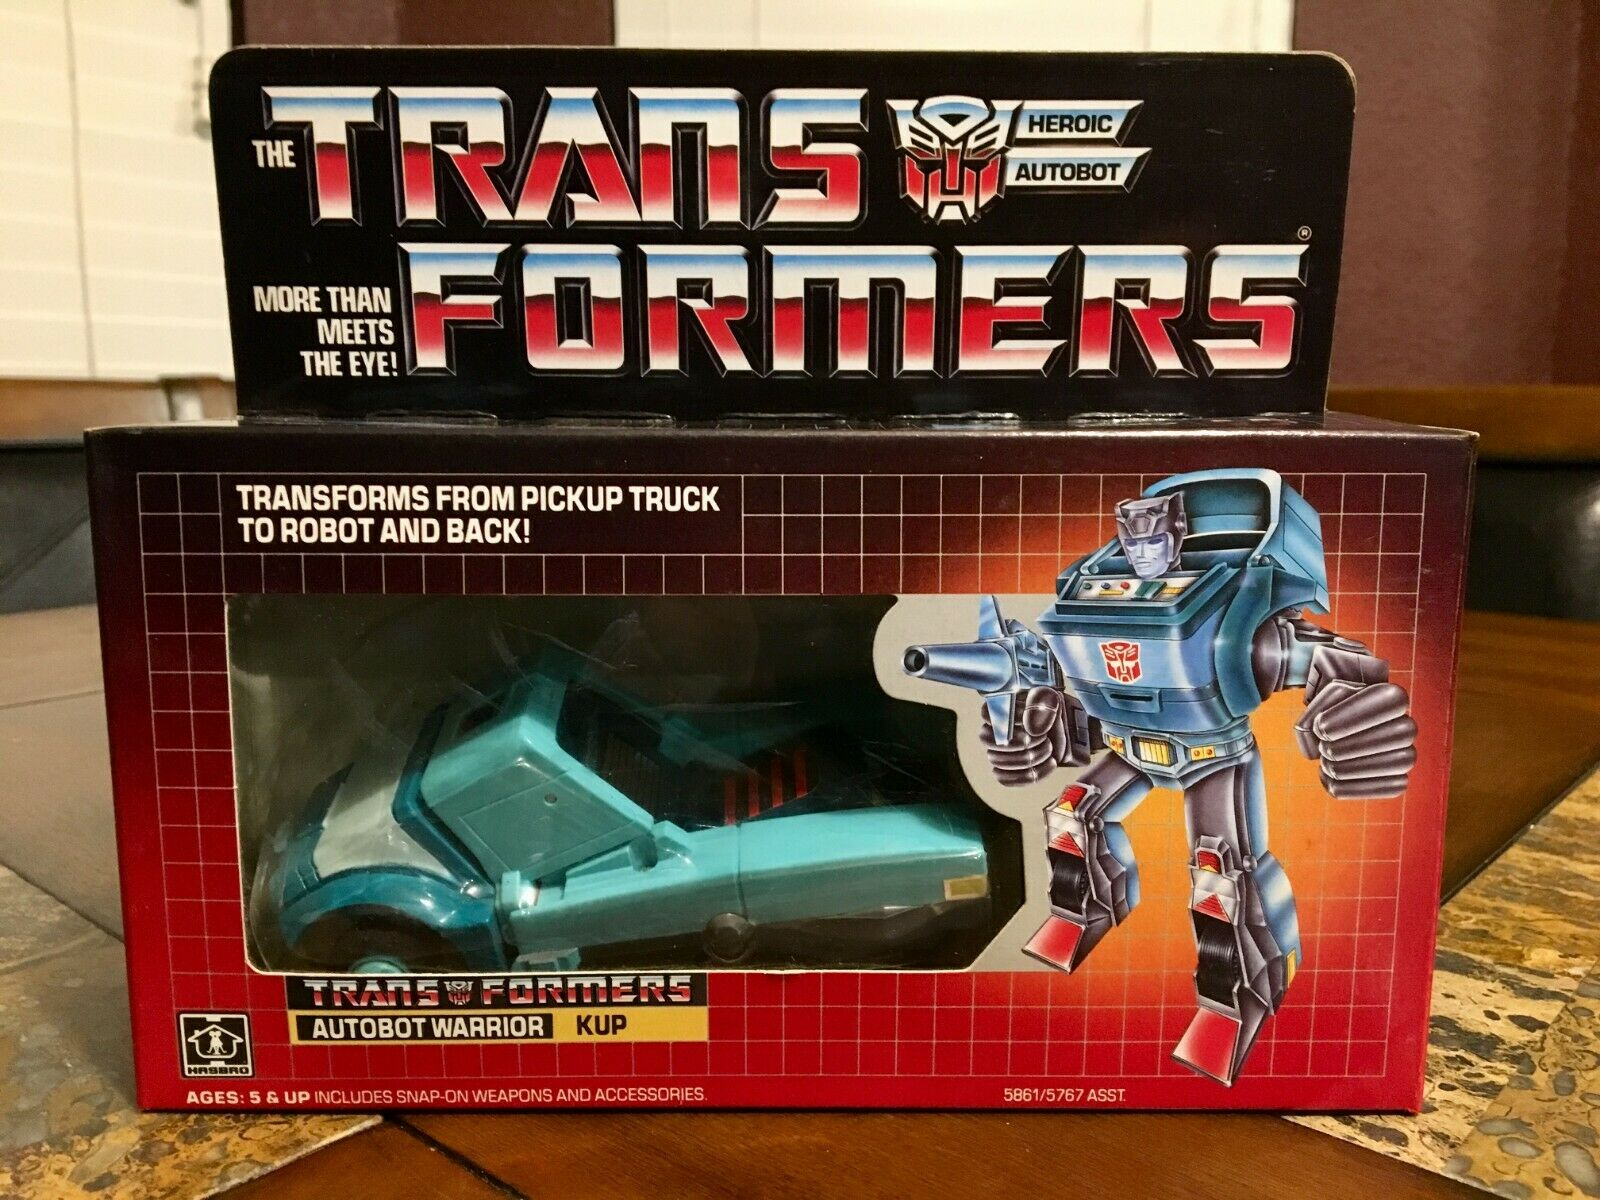 TRANSFORMERS HASBRO 1986 AUTHENTIC G1 KUP AUTOBOT VERY RARE